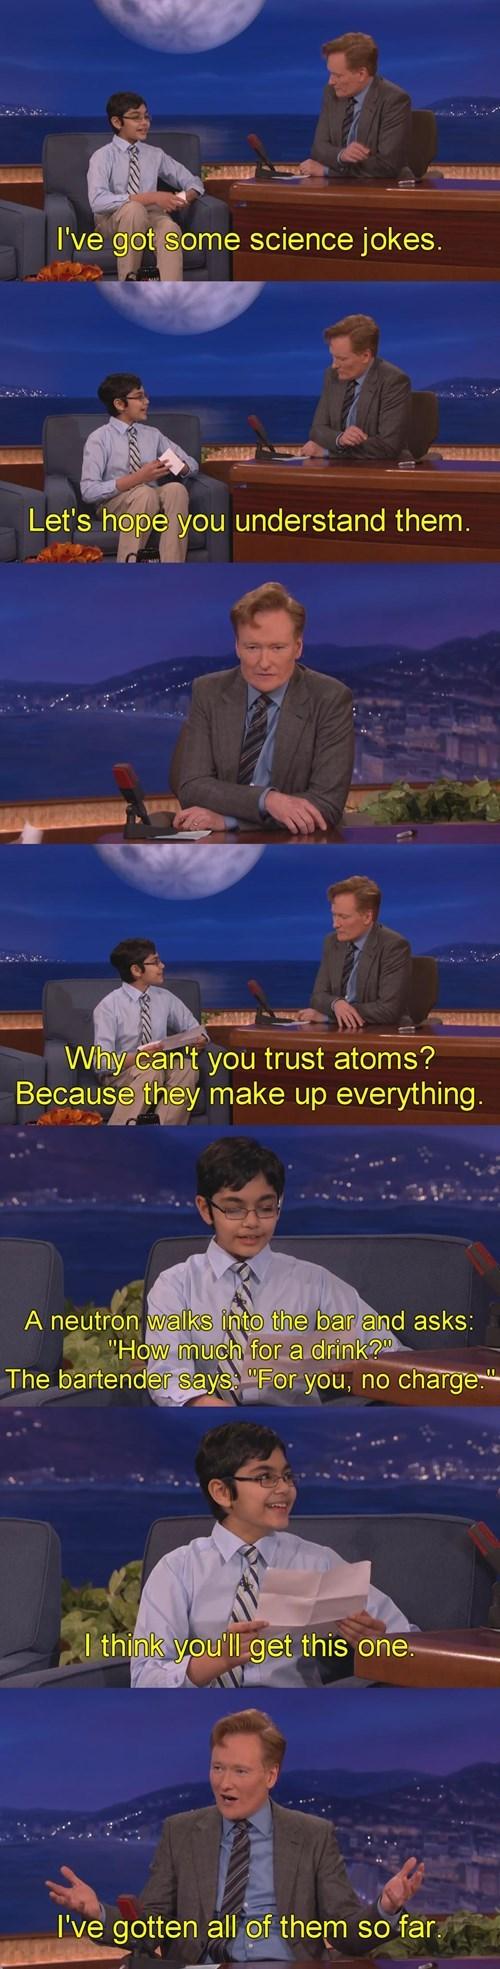 conan obrien listens to a kid telling science jokes